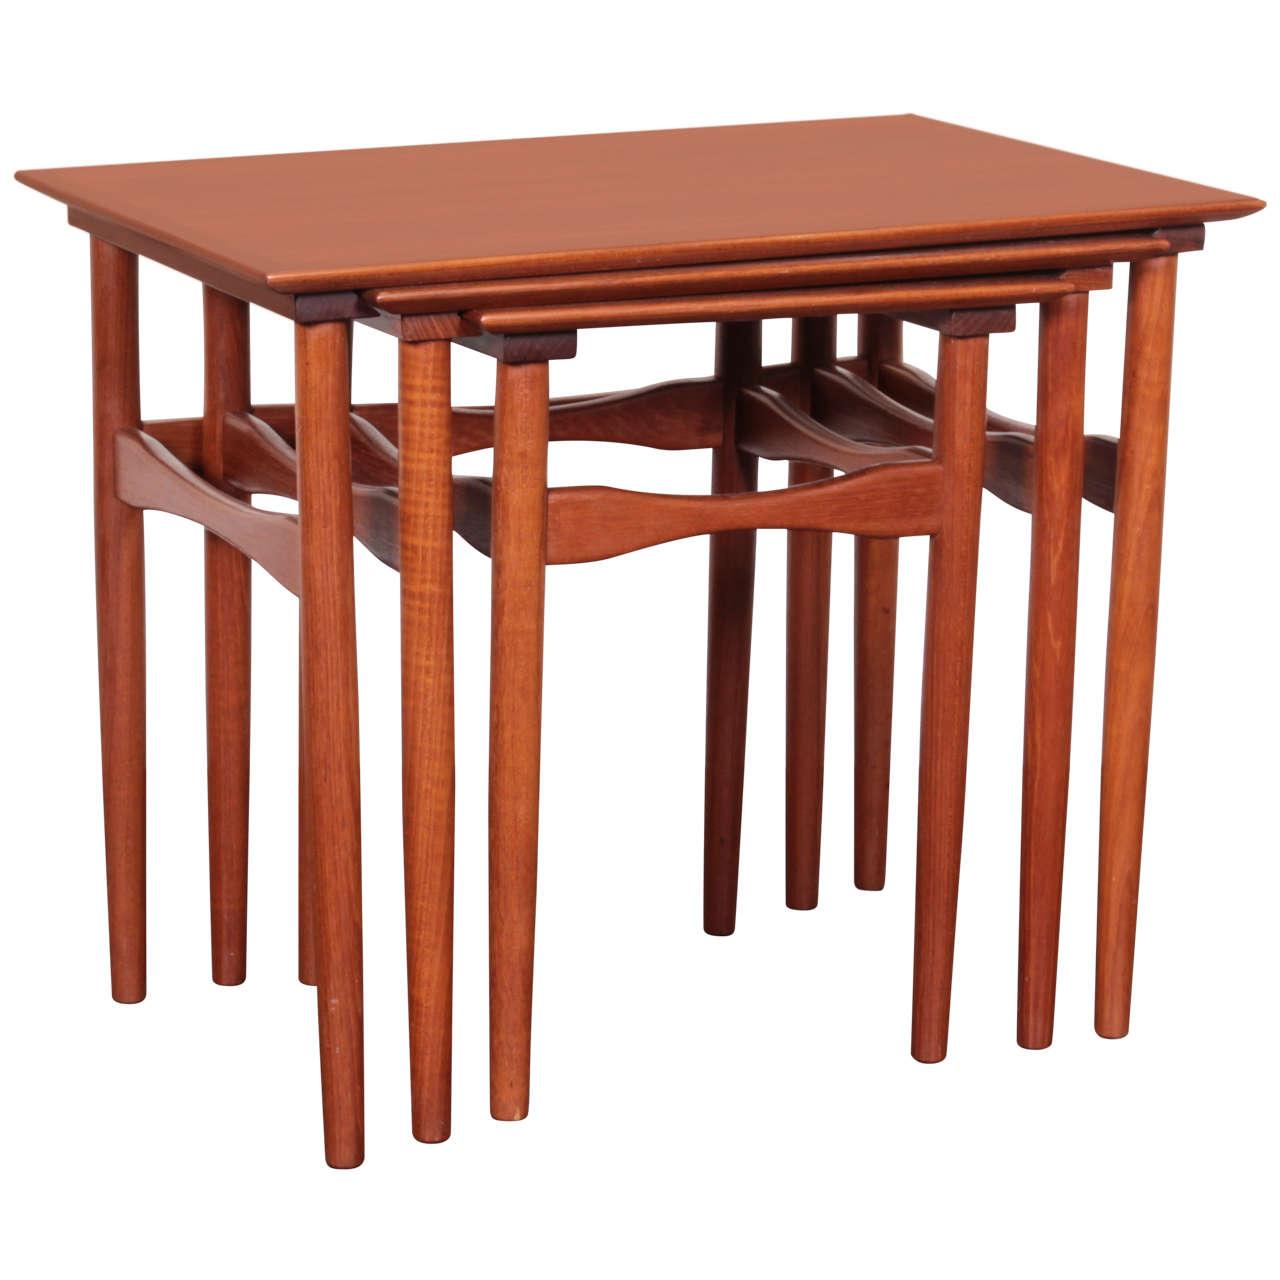 Set Of Mid-Century Danish Teak Nesting Tables By Fabian At